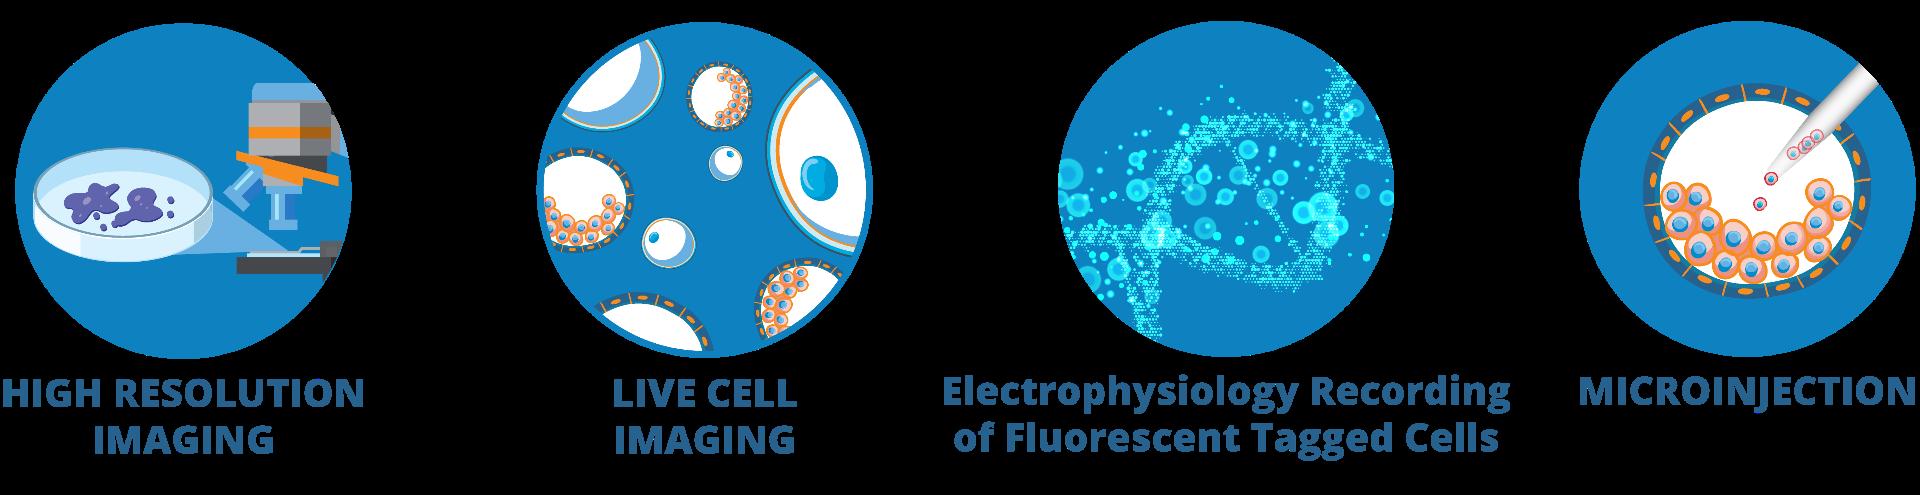 Fluorodish application icons